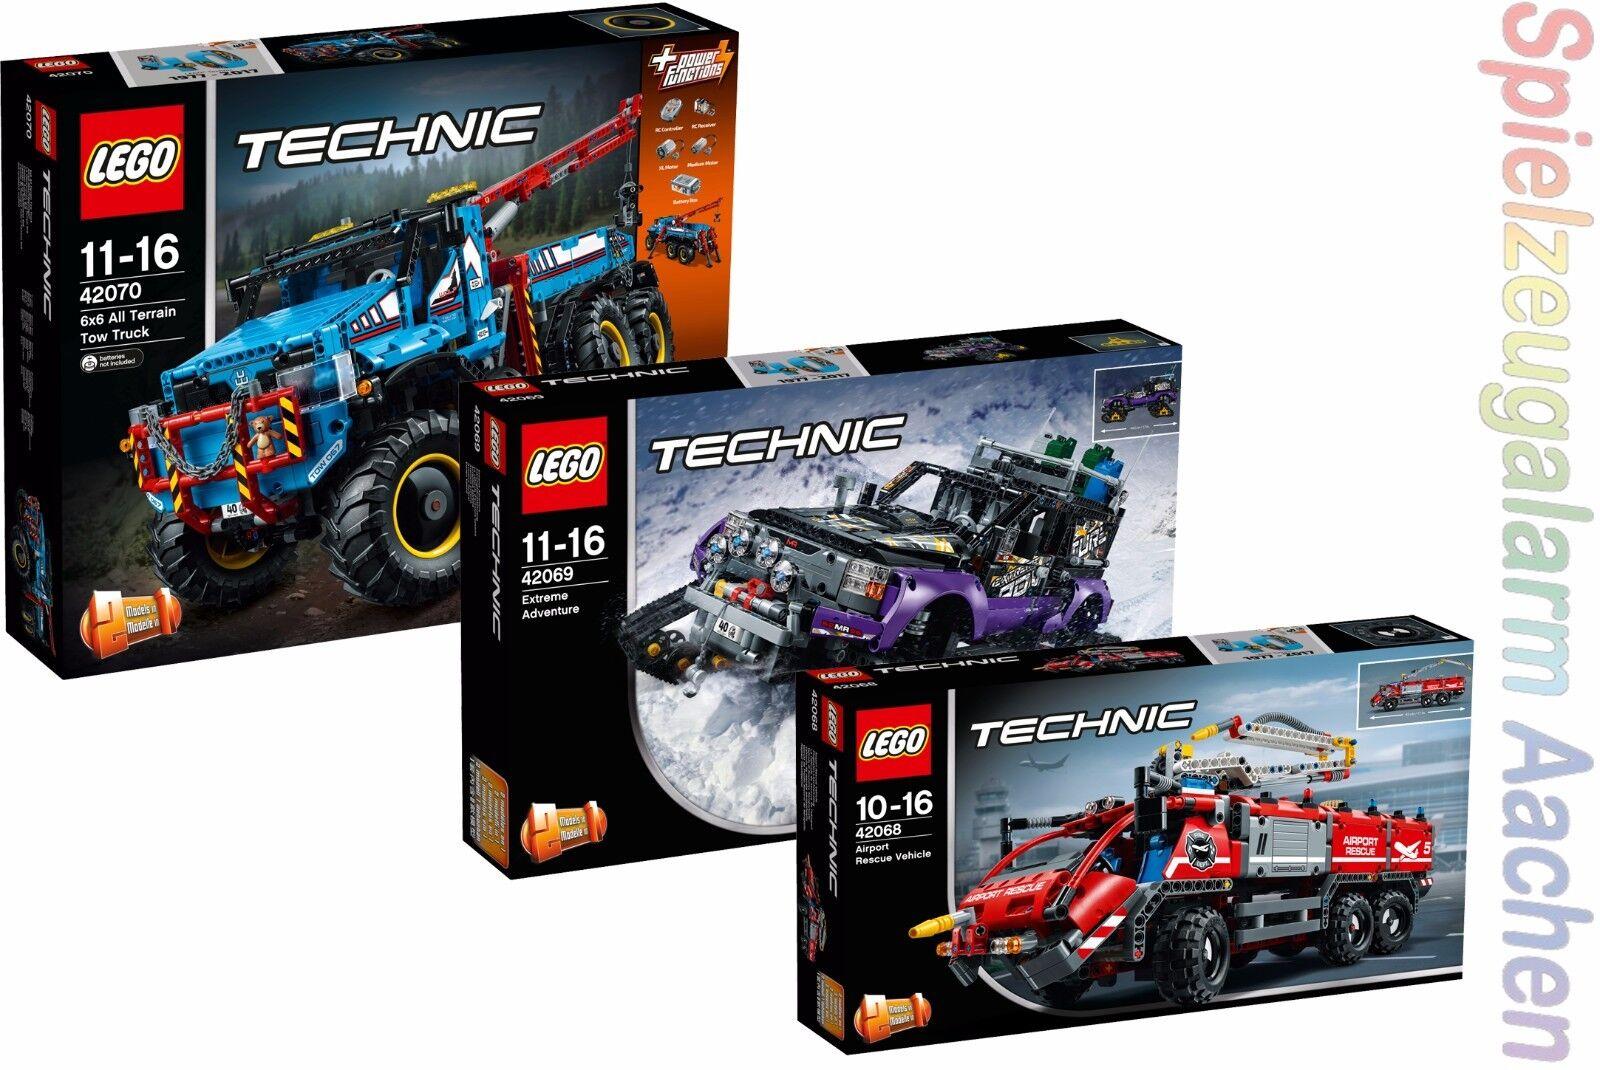 LEGO TECHNIC 42068 42069 42070  Extremgeländefahrzeug Extreme Adventure N8 17